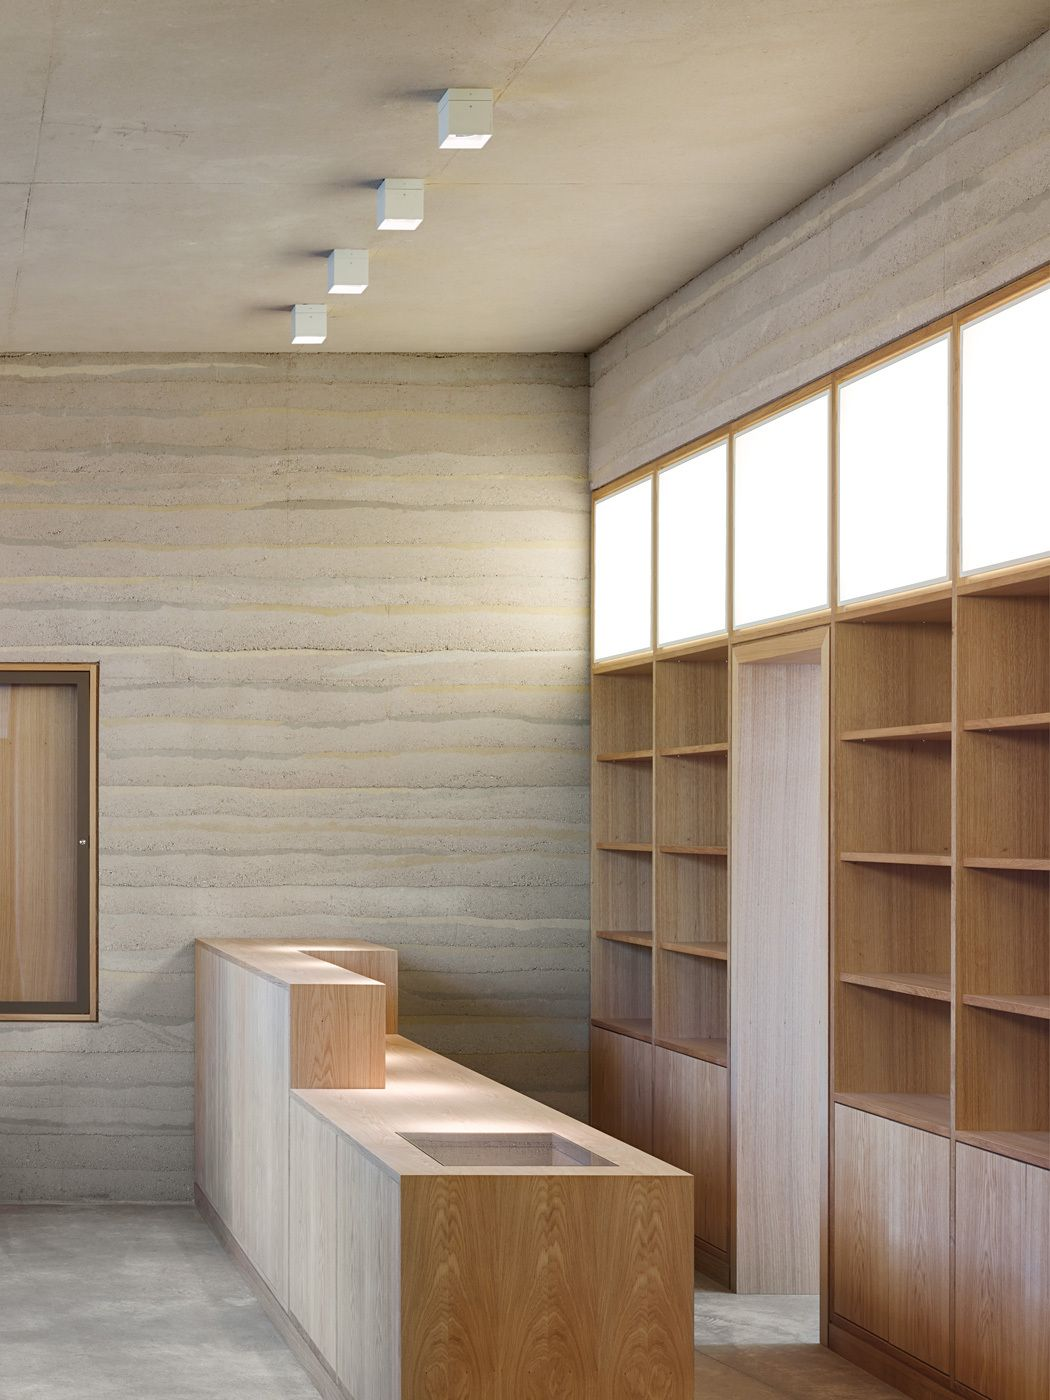 Showcase sparrenburg visitor center by max dudler for Interior design bielefeld